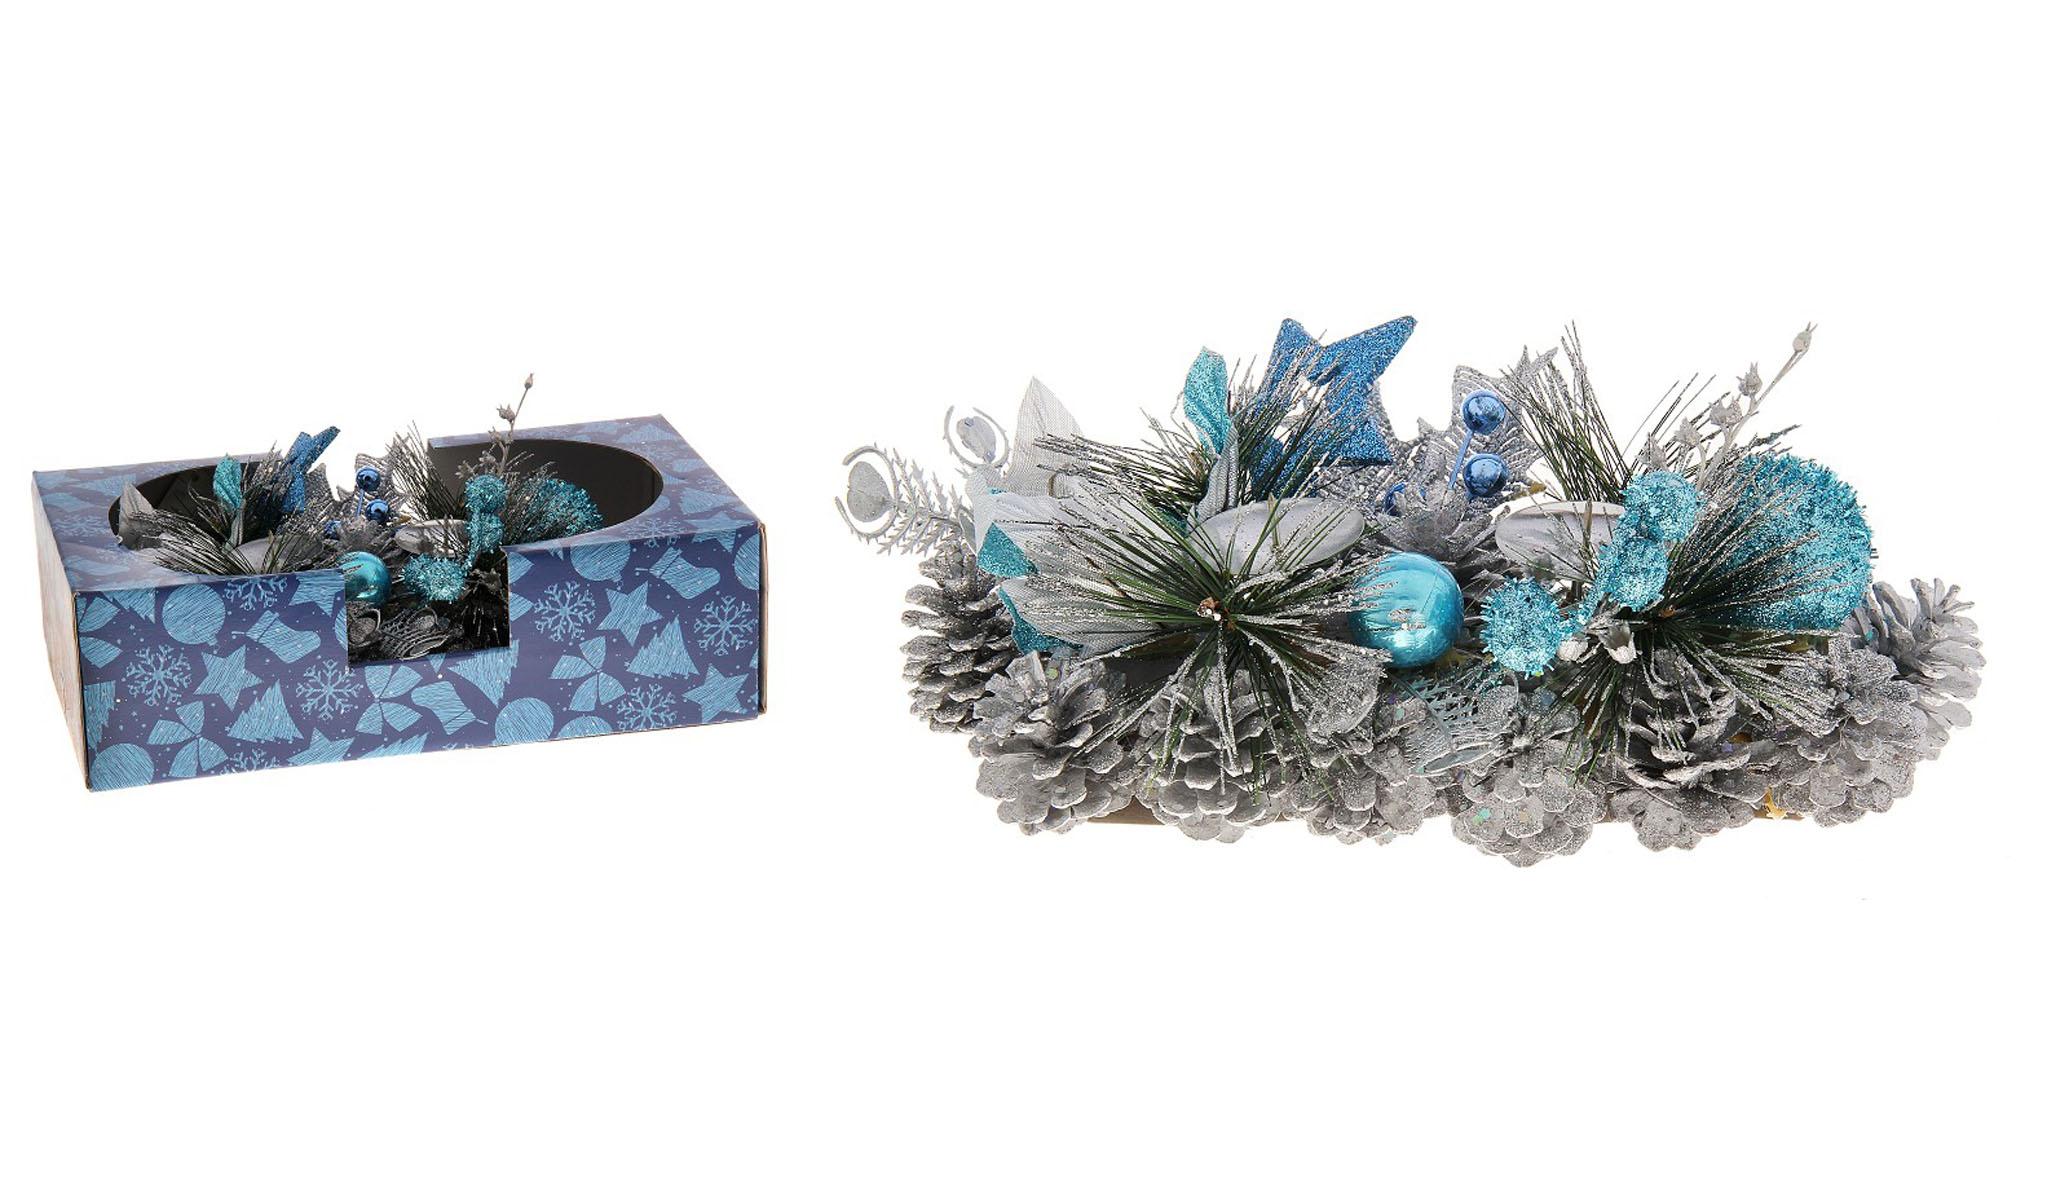 Подсвечник Sima-land Шишки, на 2 свечи, цвет: голубой, серебристый. 717988717988